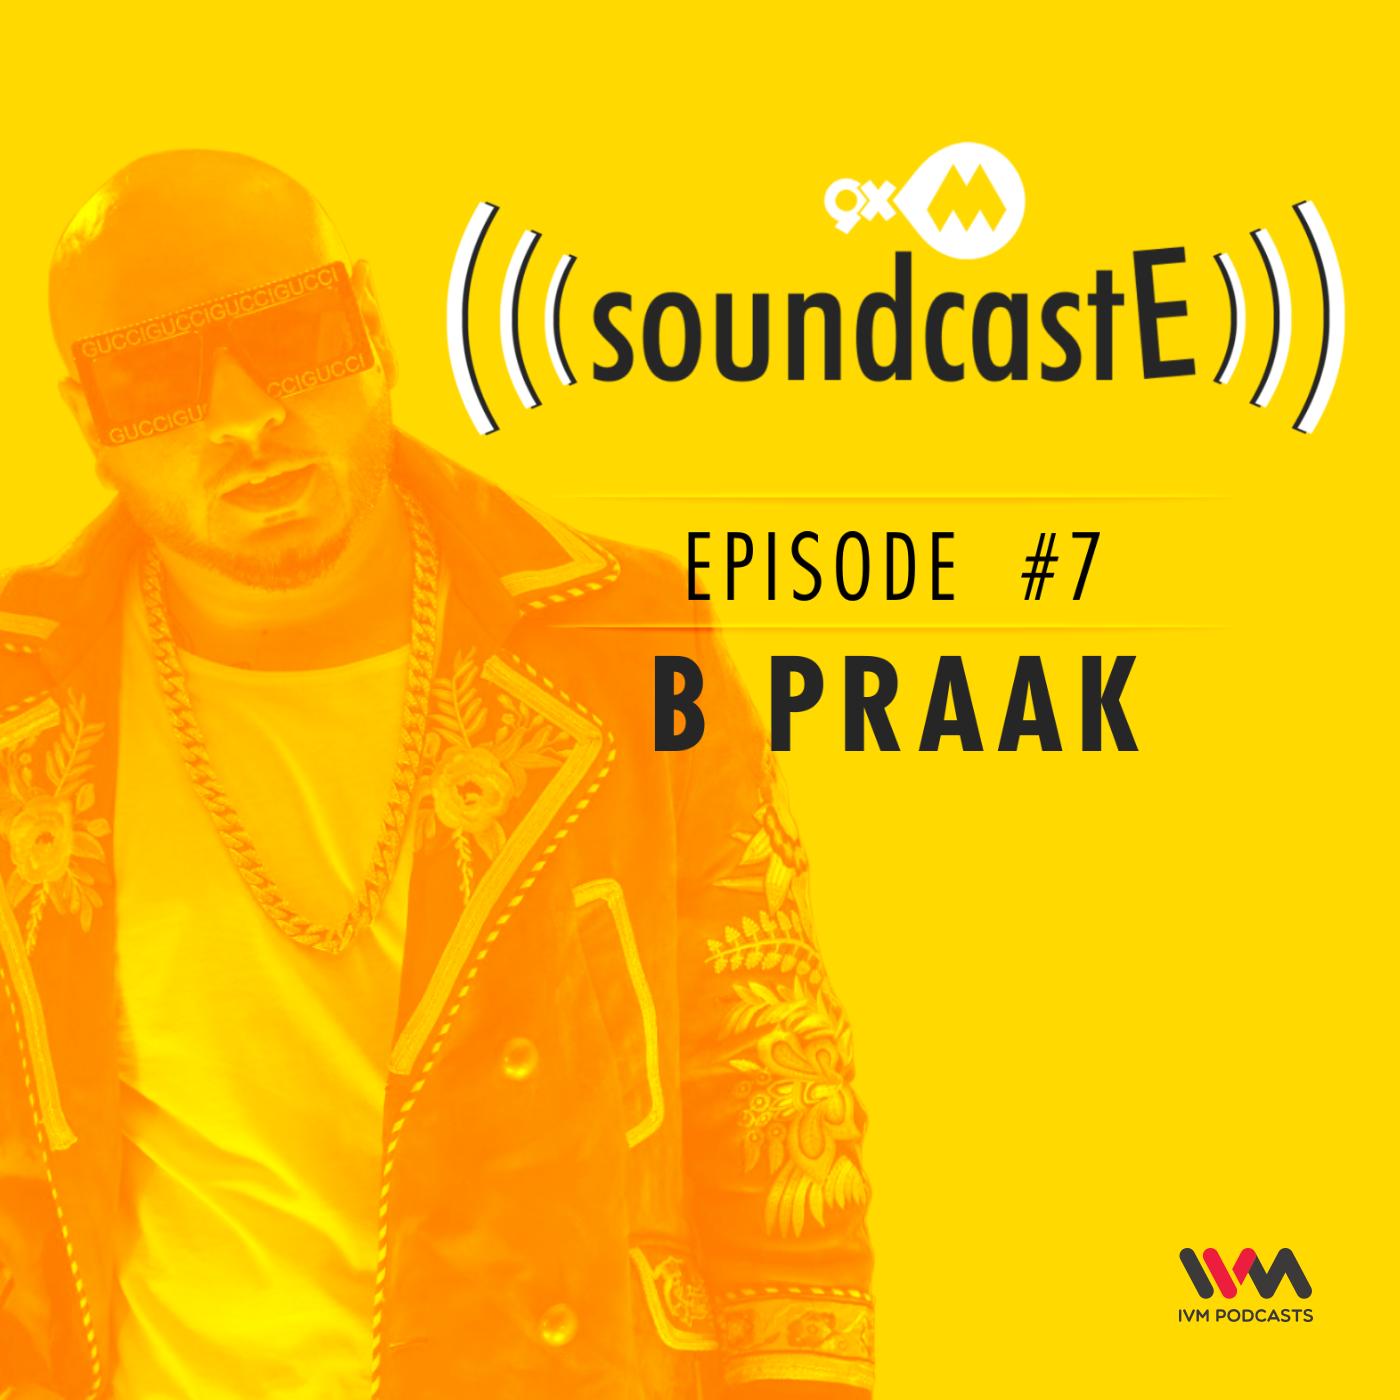 Ep. 07: 9XM SoundcastE with B Praak